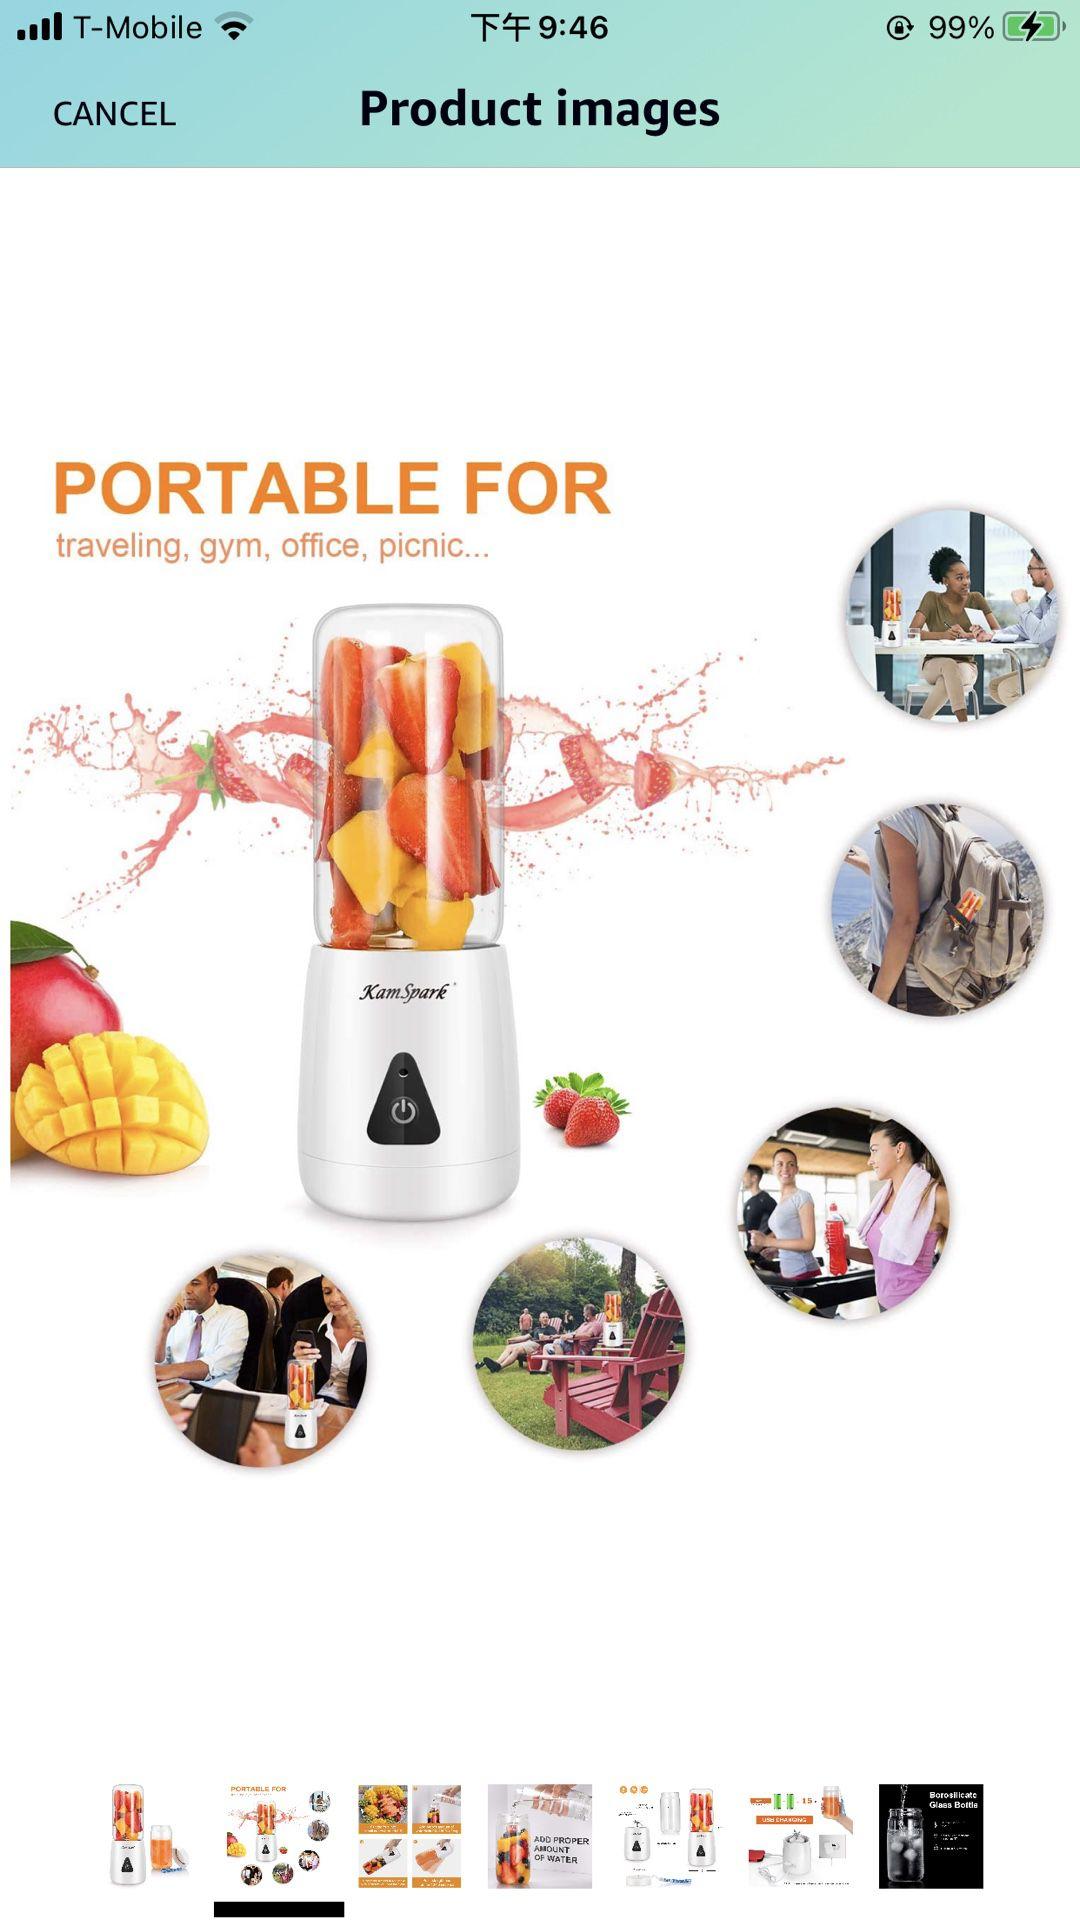 Portable Blender-KamSpark Smoothie Blender USB Rechargeable Battery Operated 2000mAh, Mini Blender (12oz), 6 Blades, Glass Cup BPA Free Food Grade, De